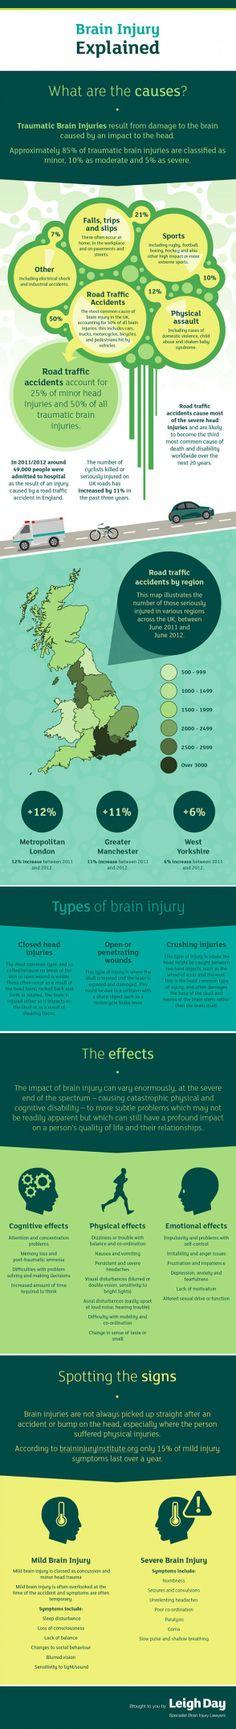 Brain Injury Explained | TryMunity